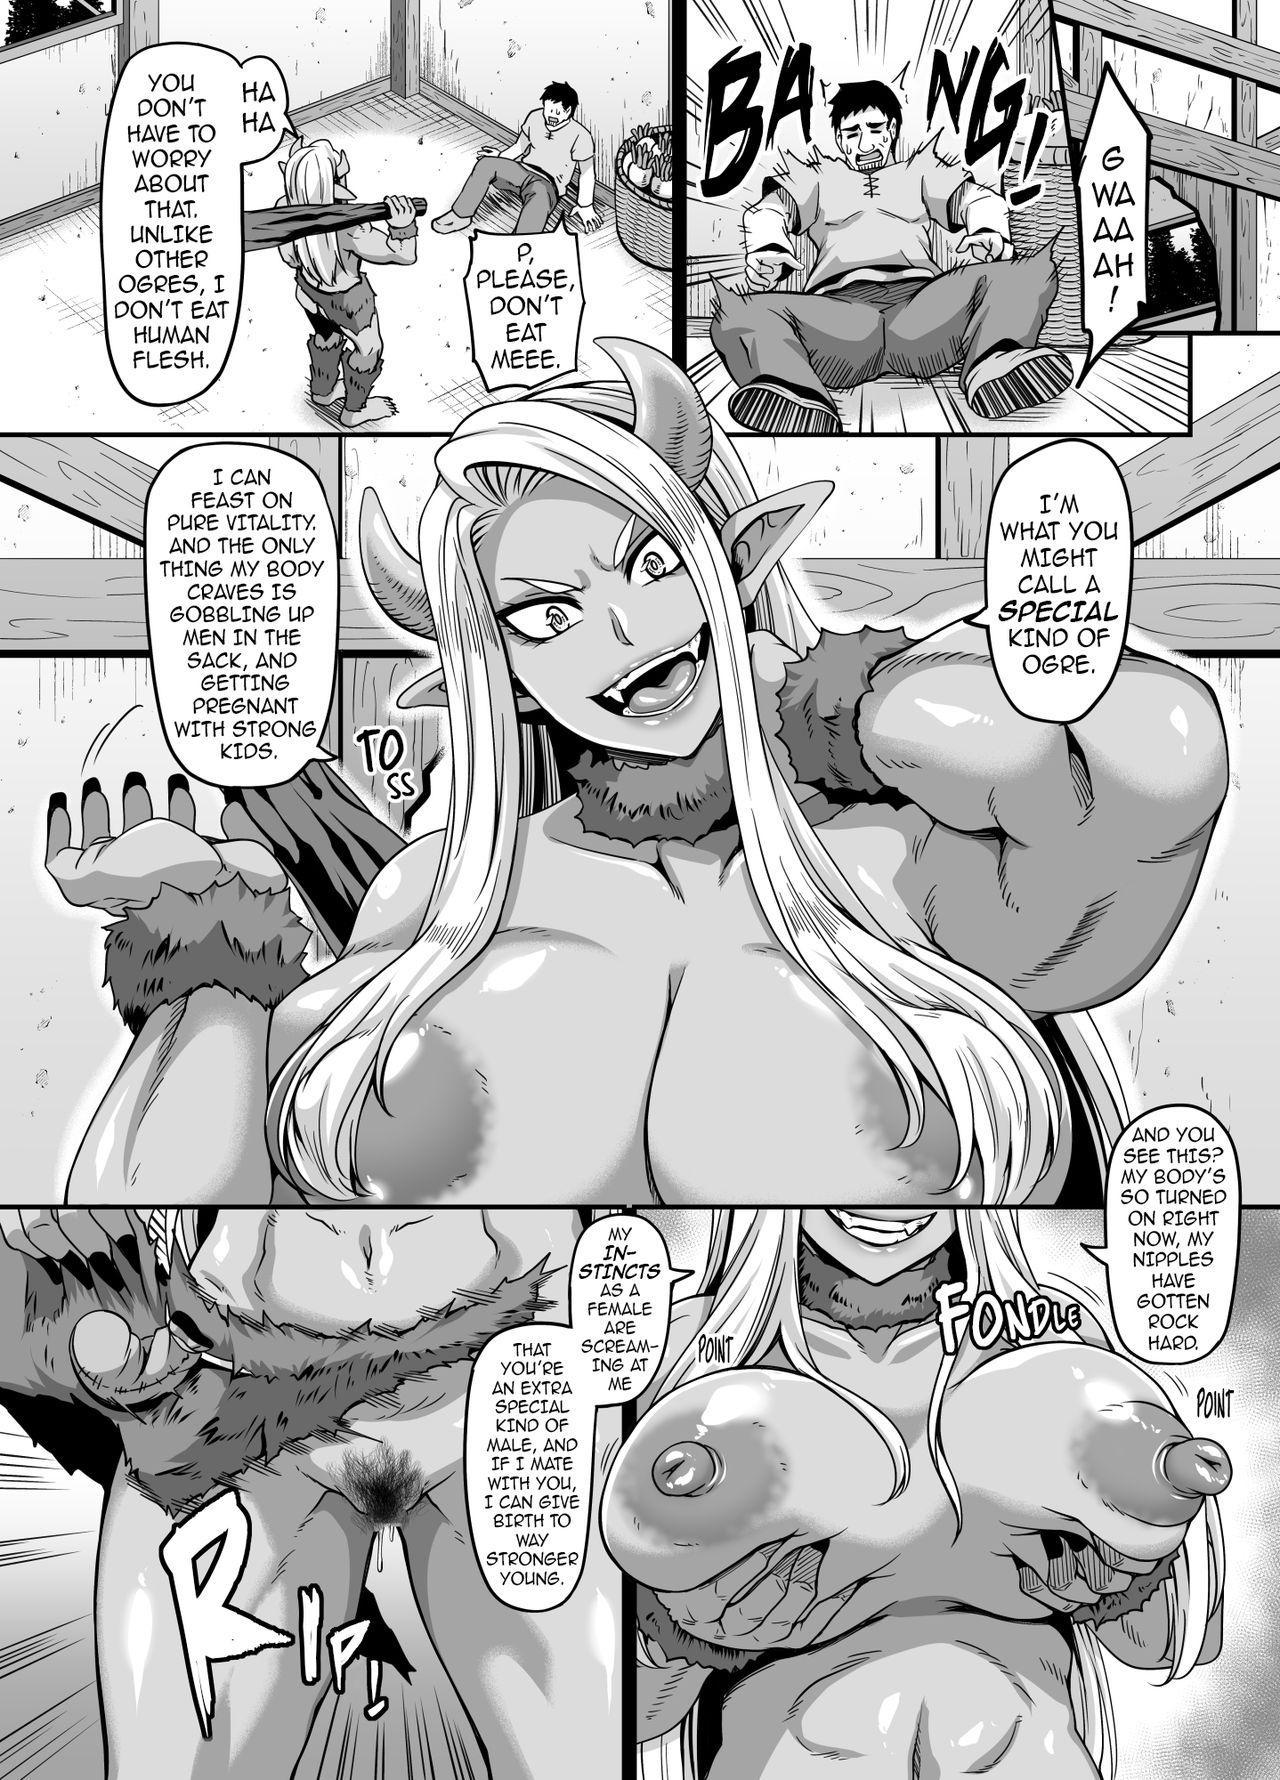 Mesu Ogre wa Kentauros Chinpo o Musabori Okasu | Female Ogre is Gonna Fuck Centaur Horse Cock Till She Drops 4